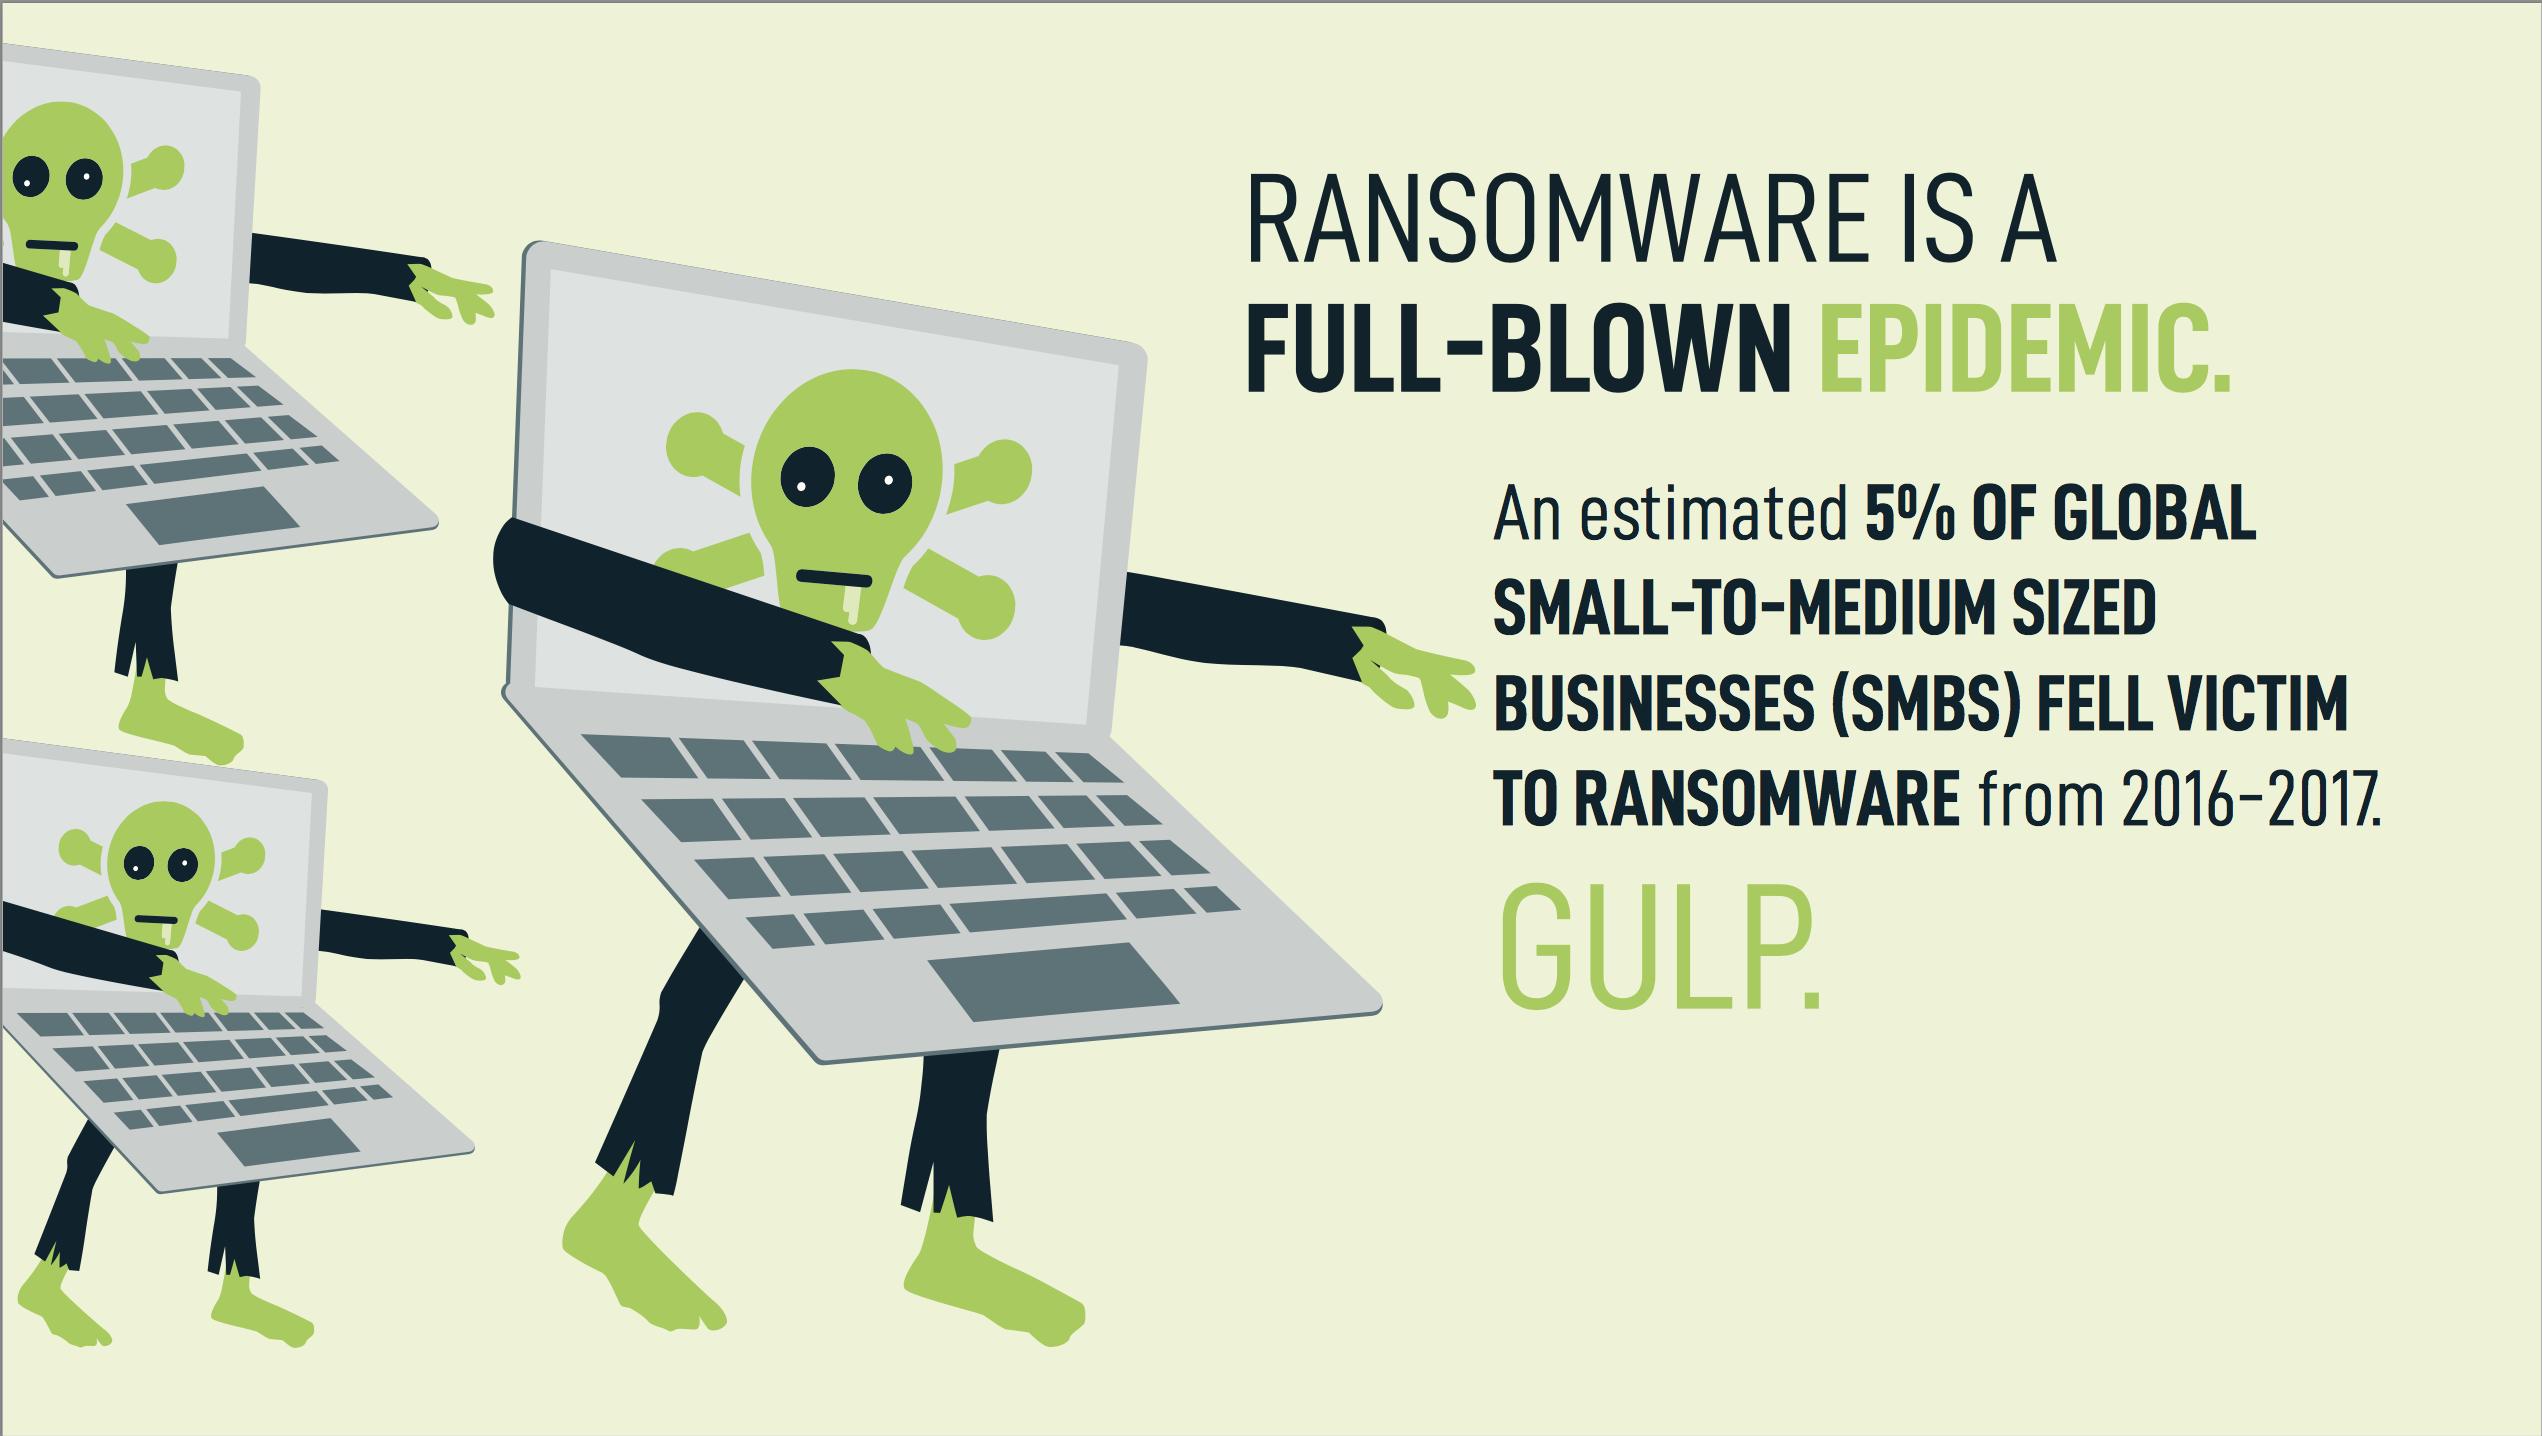 10 Ransomware statistics